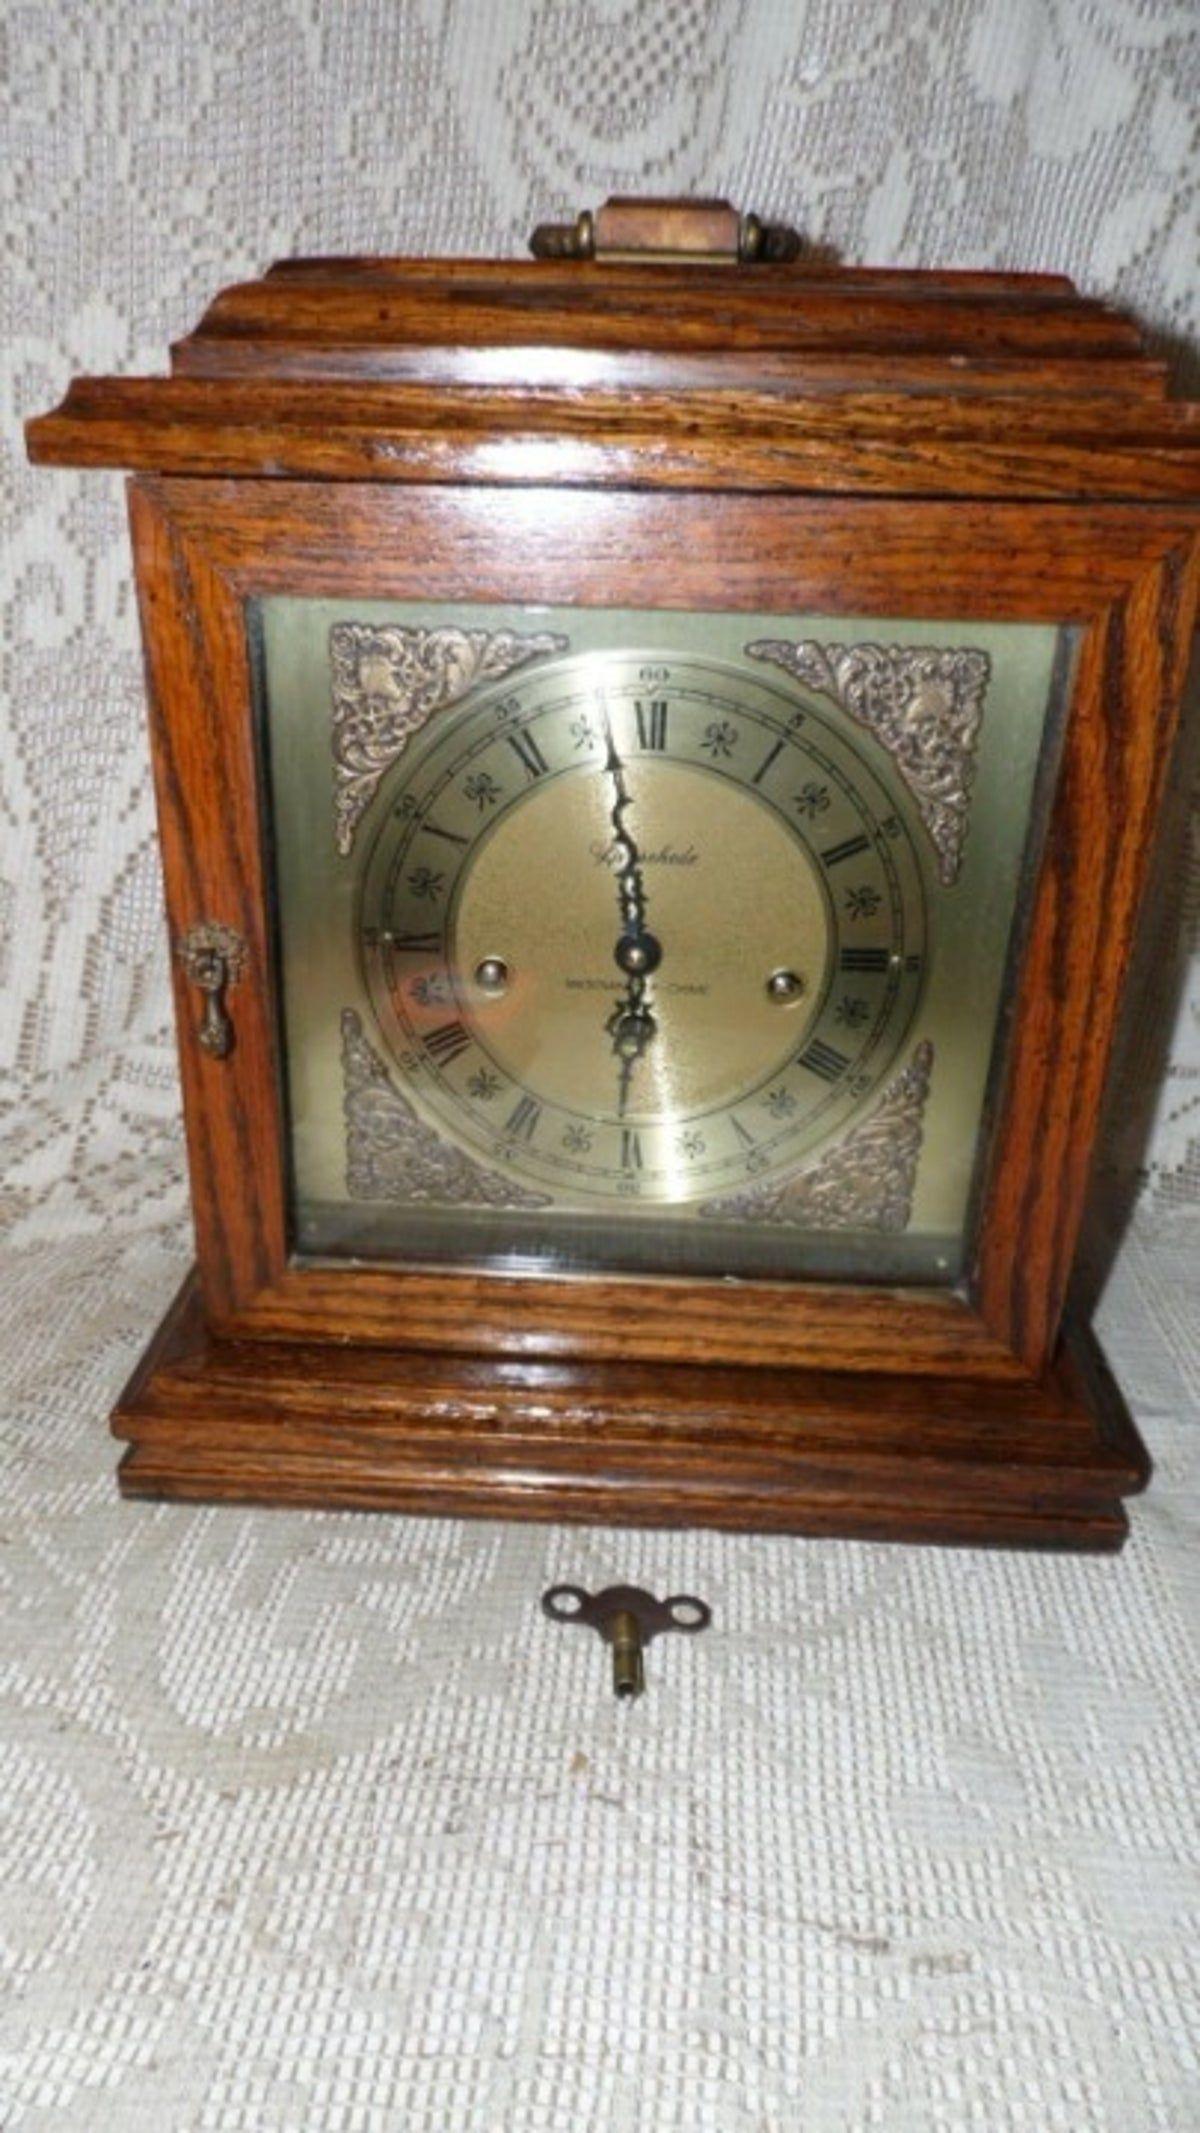 Pin By Vla Sha On Bracket Antique Clocks In 2020 Antique Mantle Clock Mantel Clock Clock